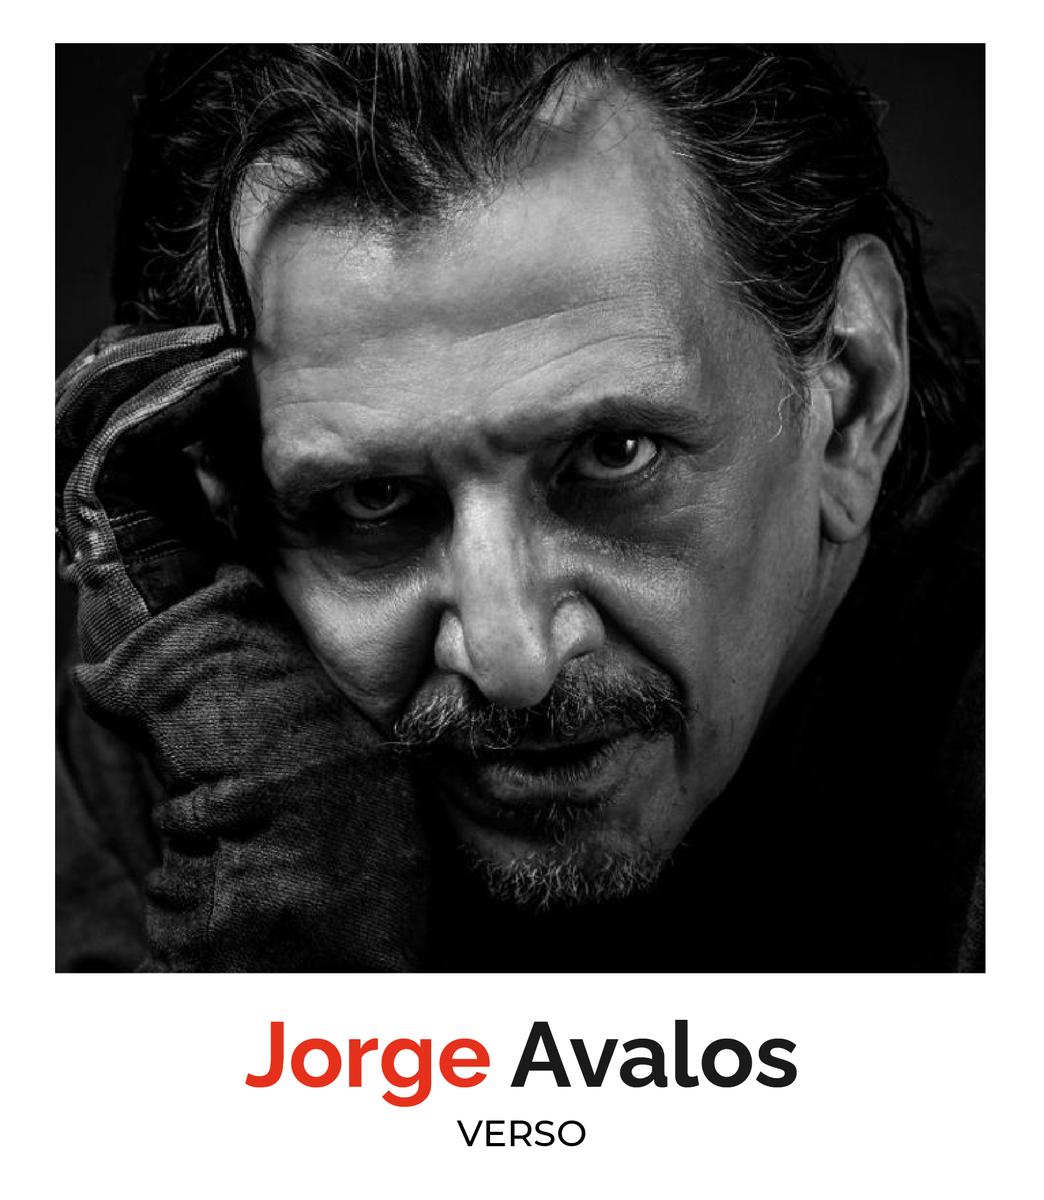 Jorge Avalos